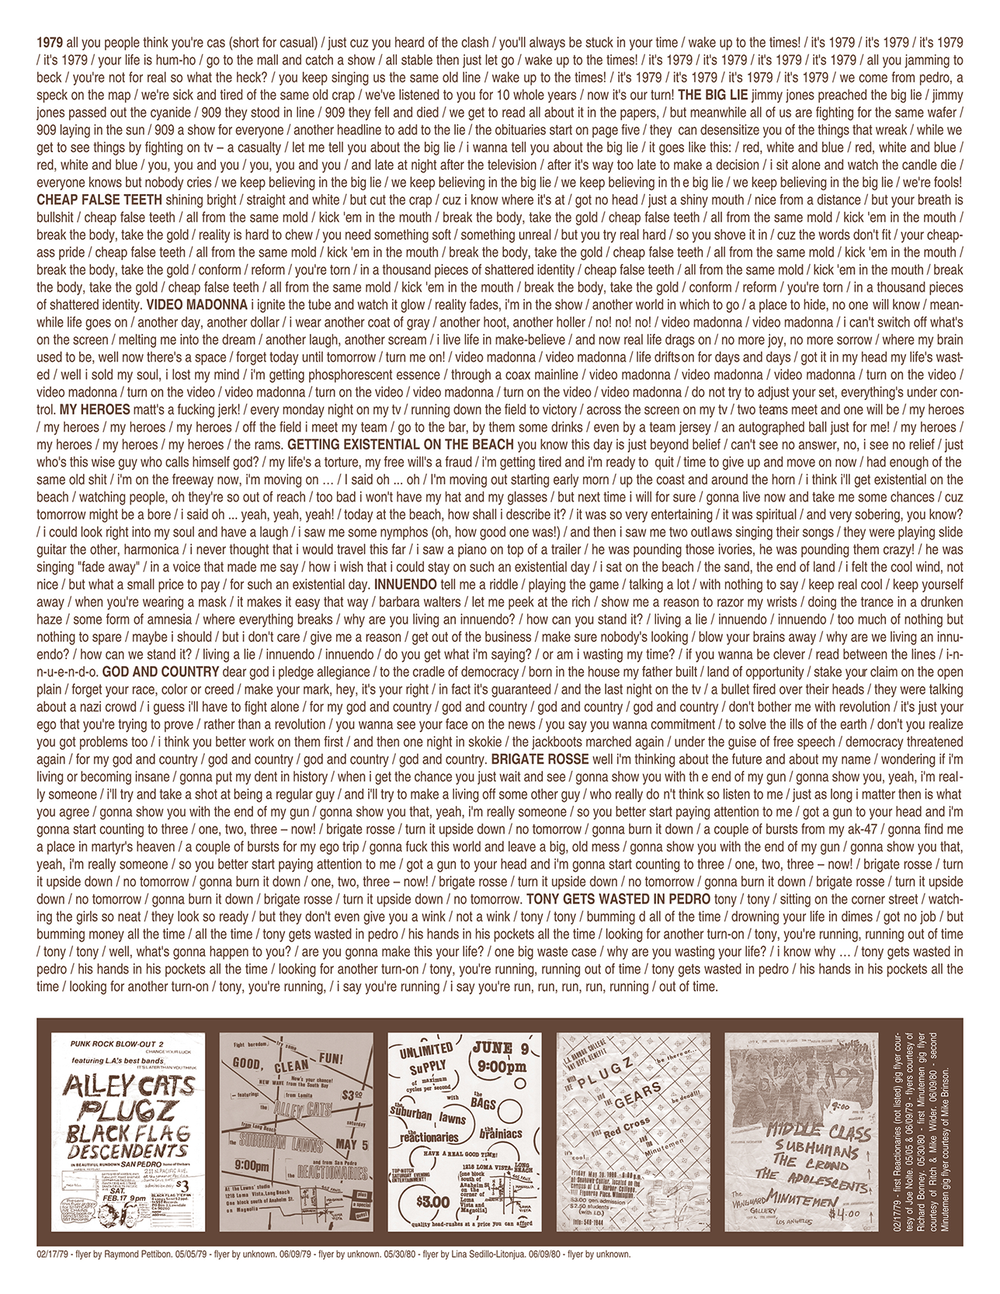 THE REACTIONARIES - 1979 Ltd. Edition → lp